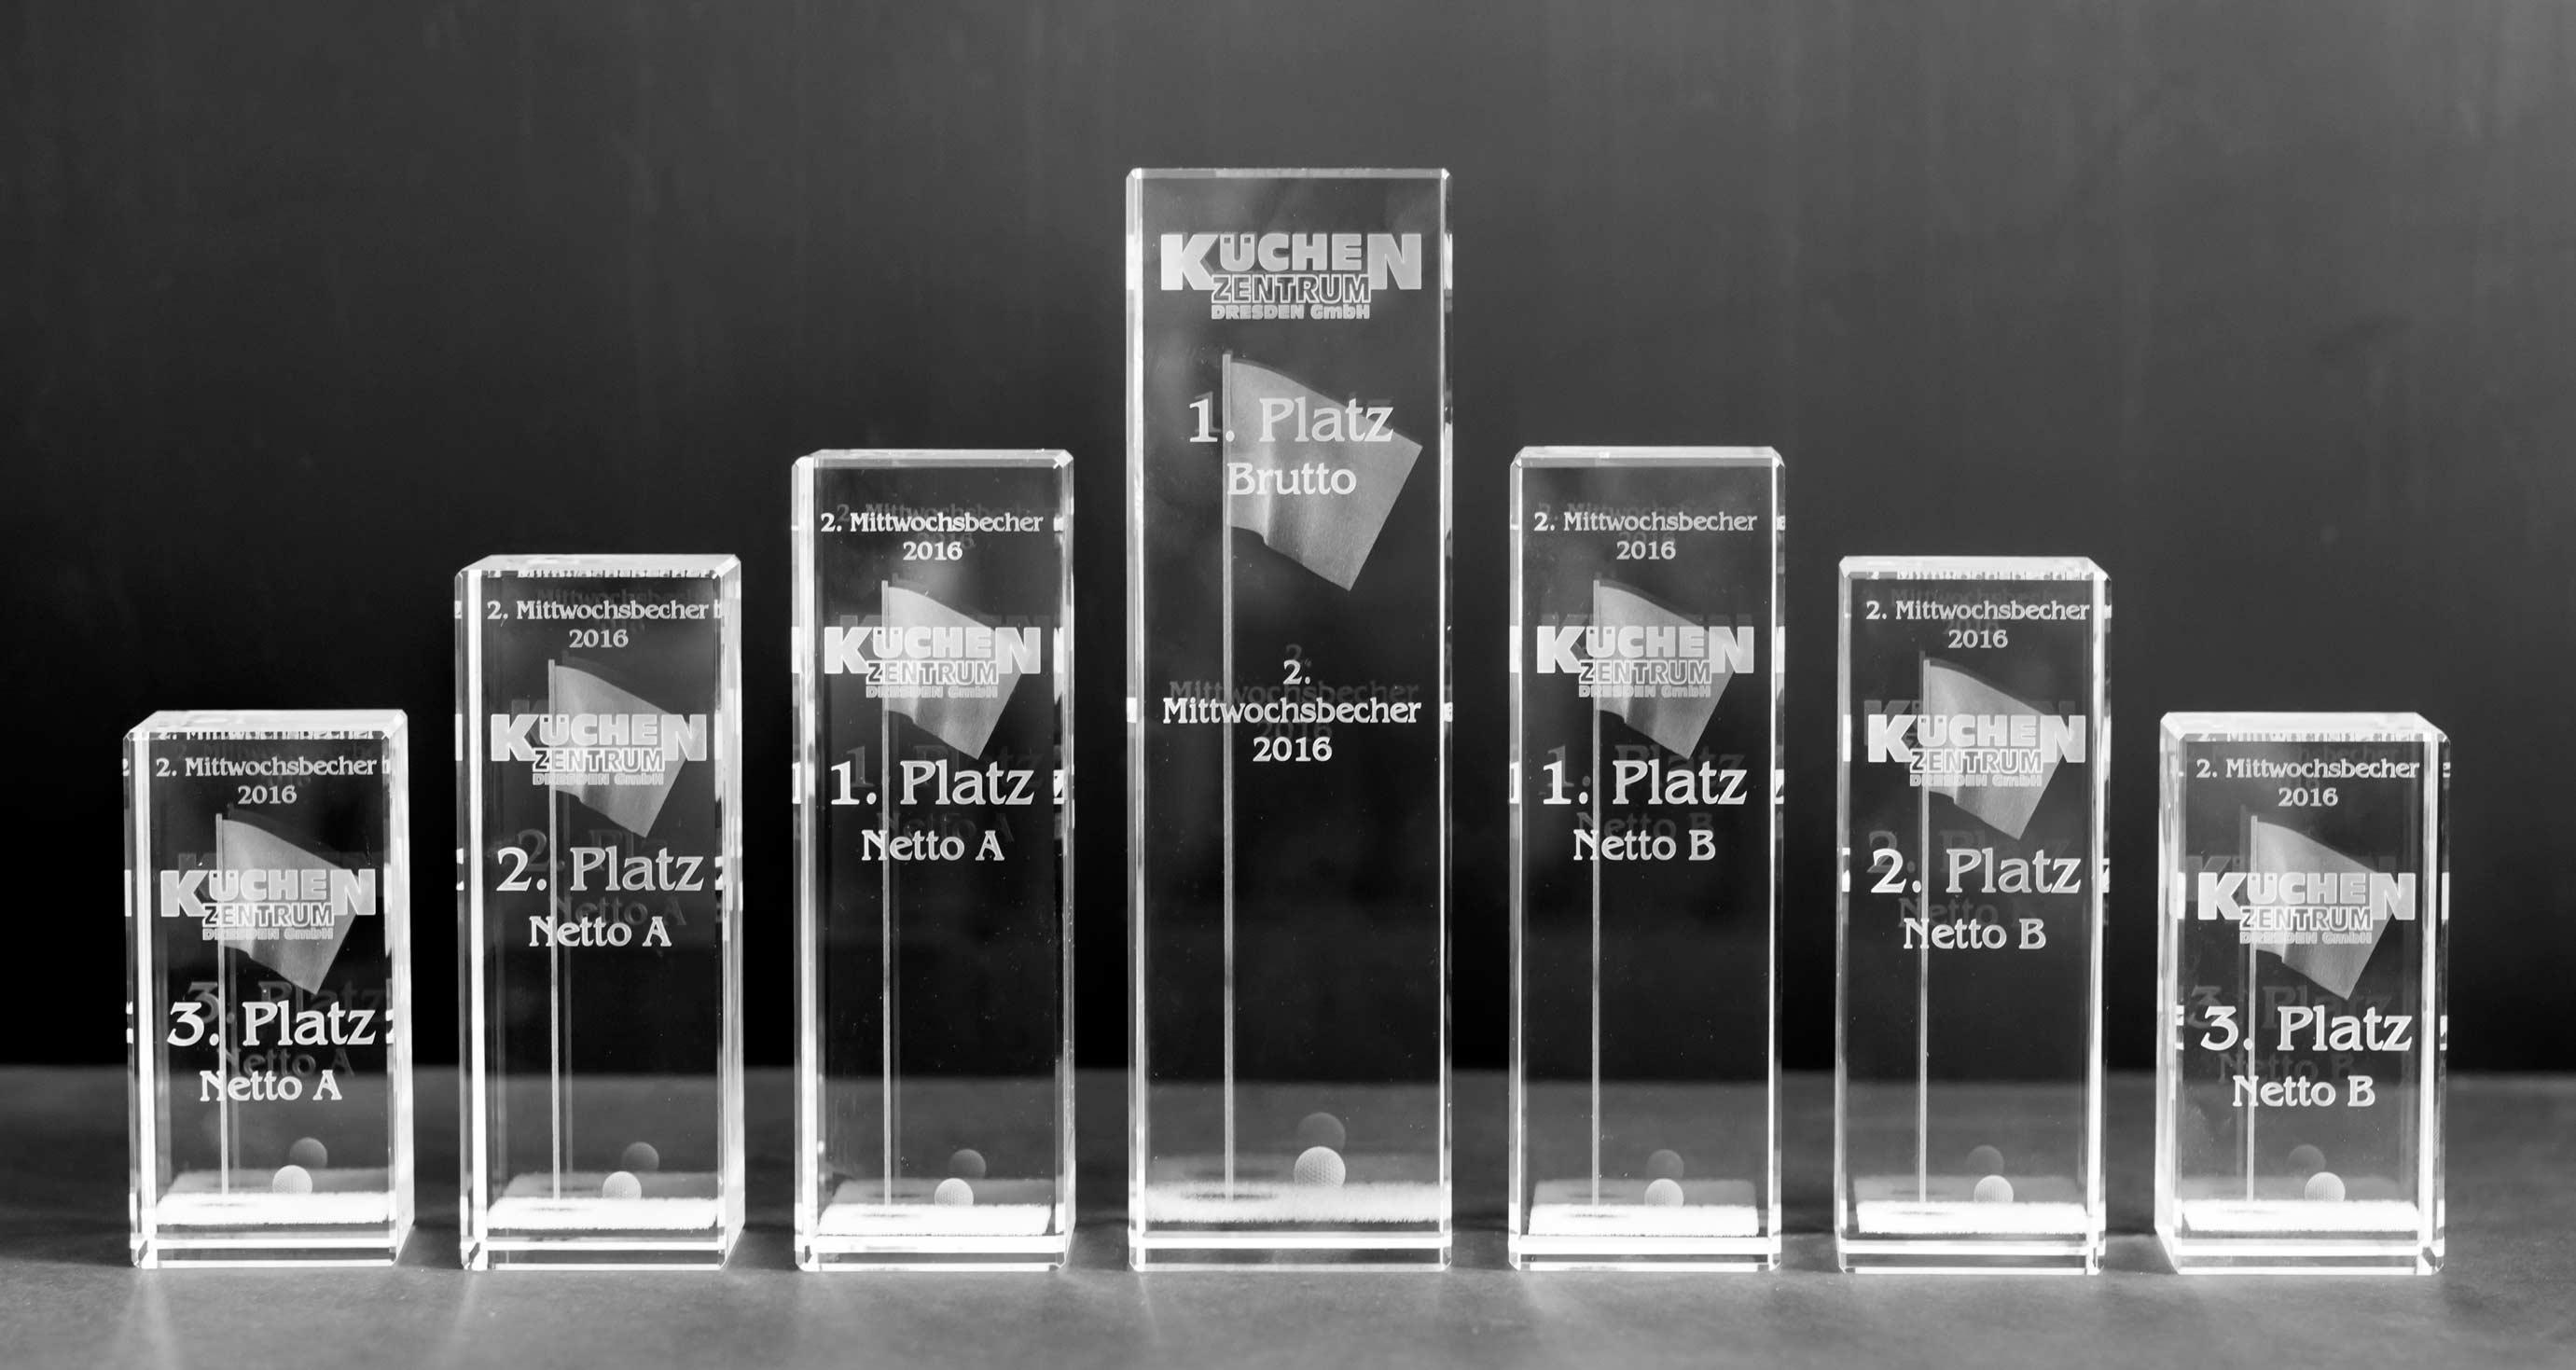 Glaspokale, 3D-Gravur, Werbung, Dresden